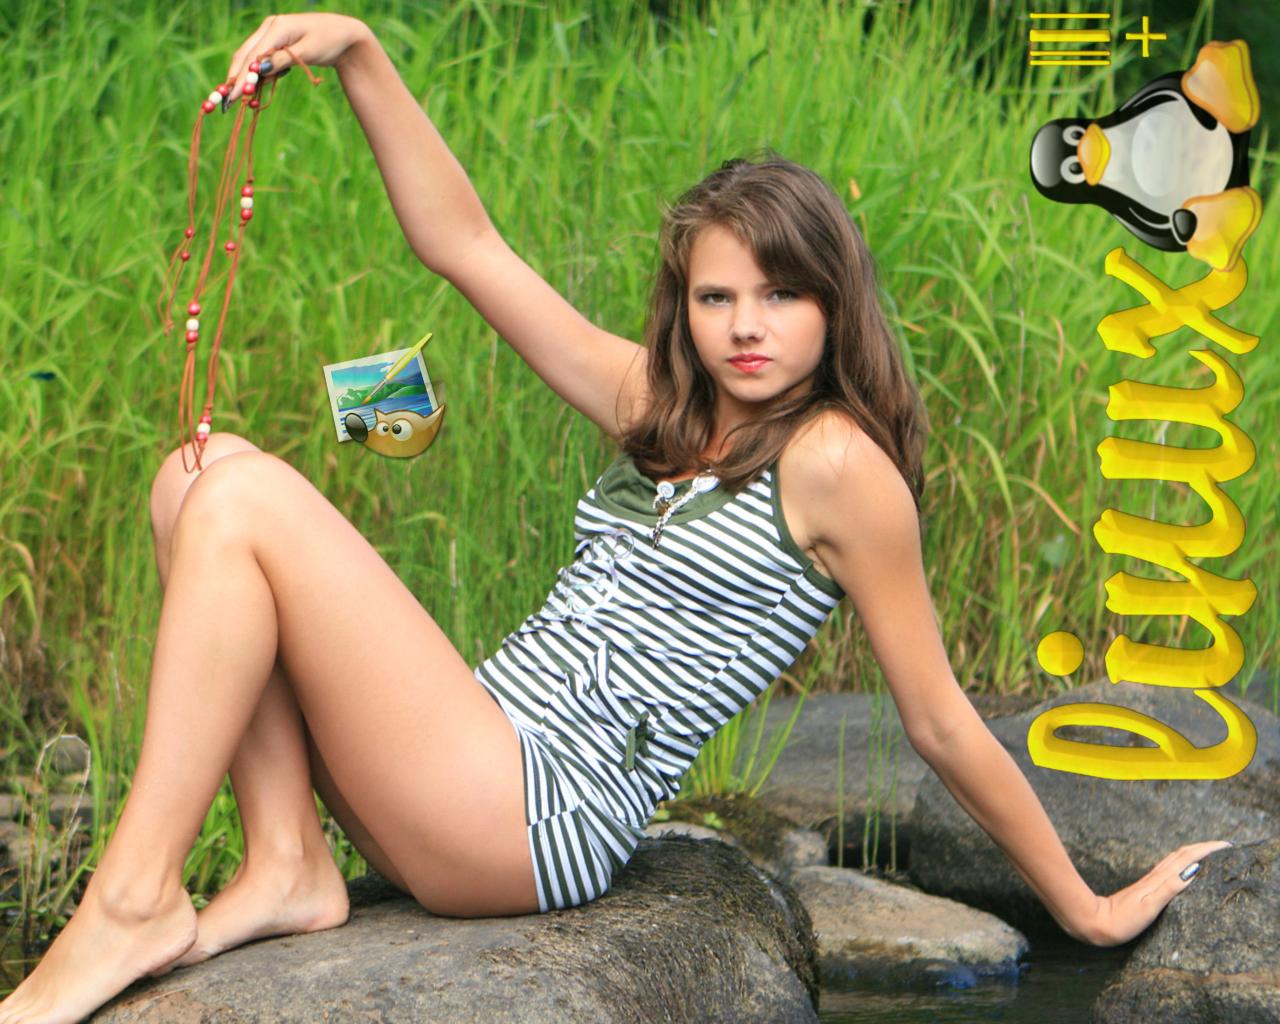 Sandra+Model+papel+de+parede-Gimp-Tux]